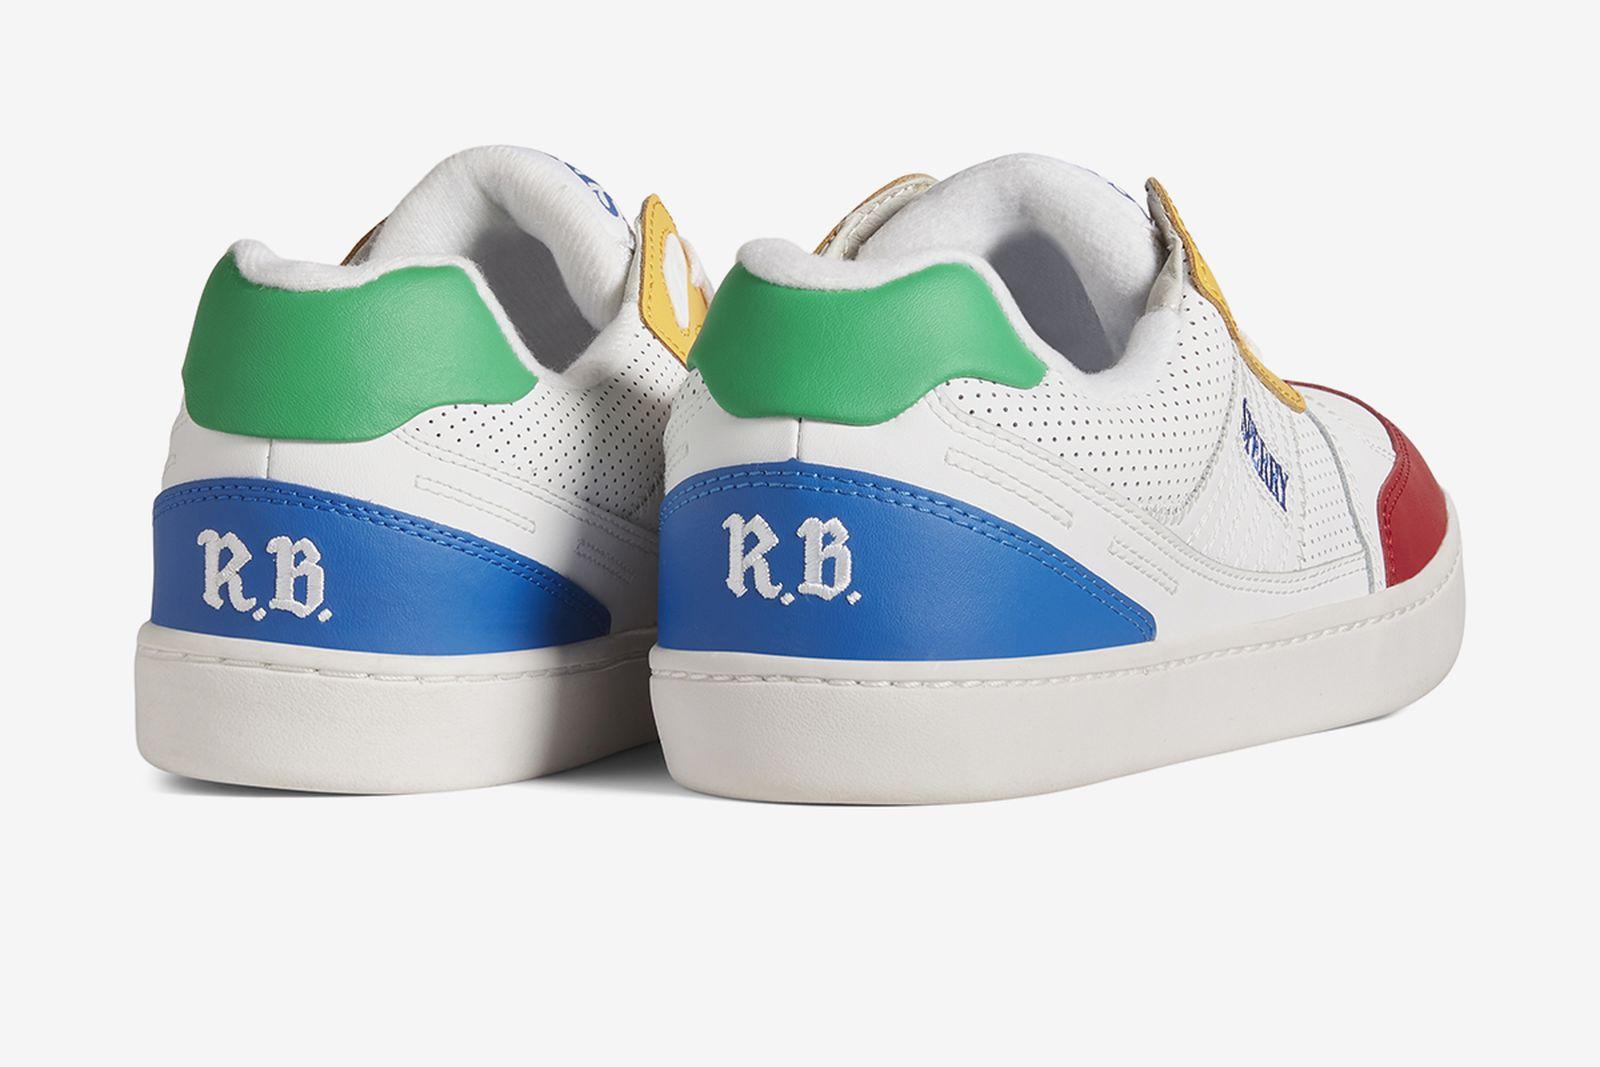 rowing-blazers-sperry-summer-2021-release-date-price-11